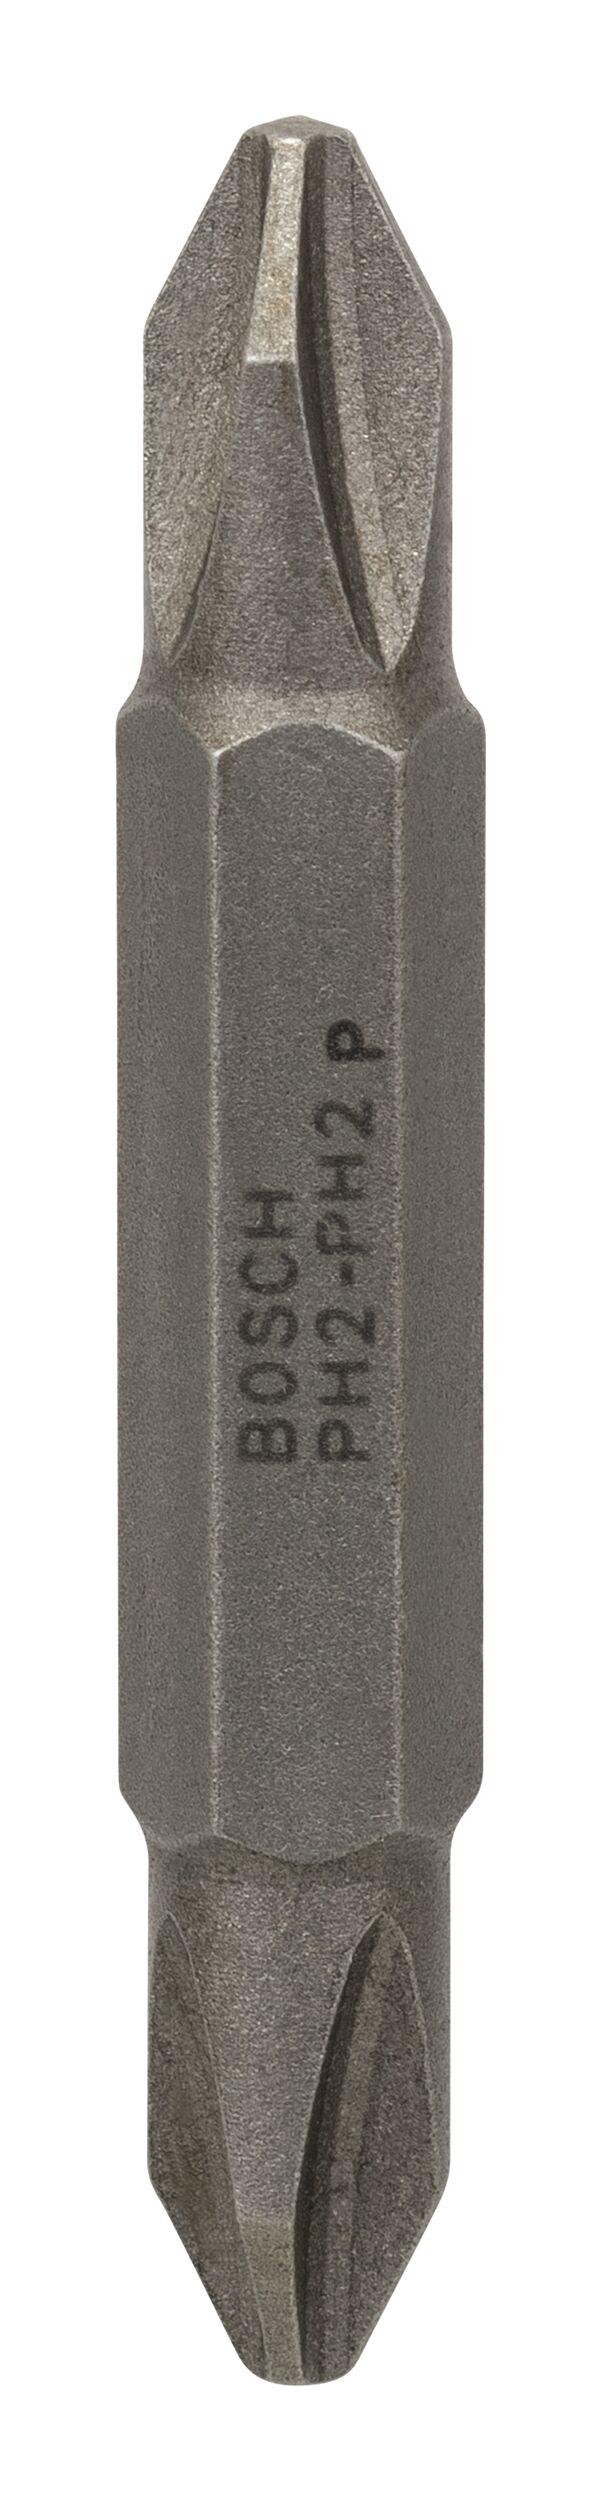 Bosch Zubehör Doppelklingenbit PH2, PH2, 45 mm - 2607001740 (VPE: 10 Stück)